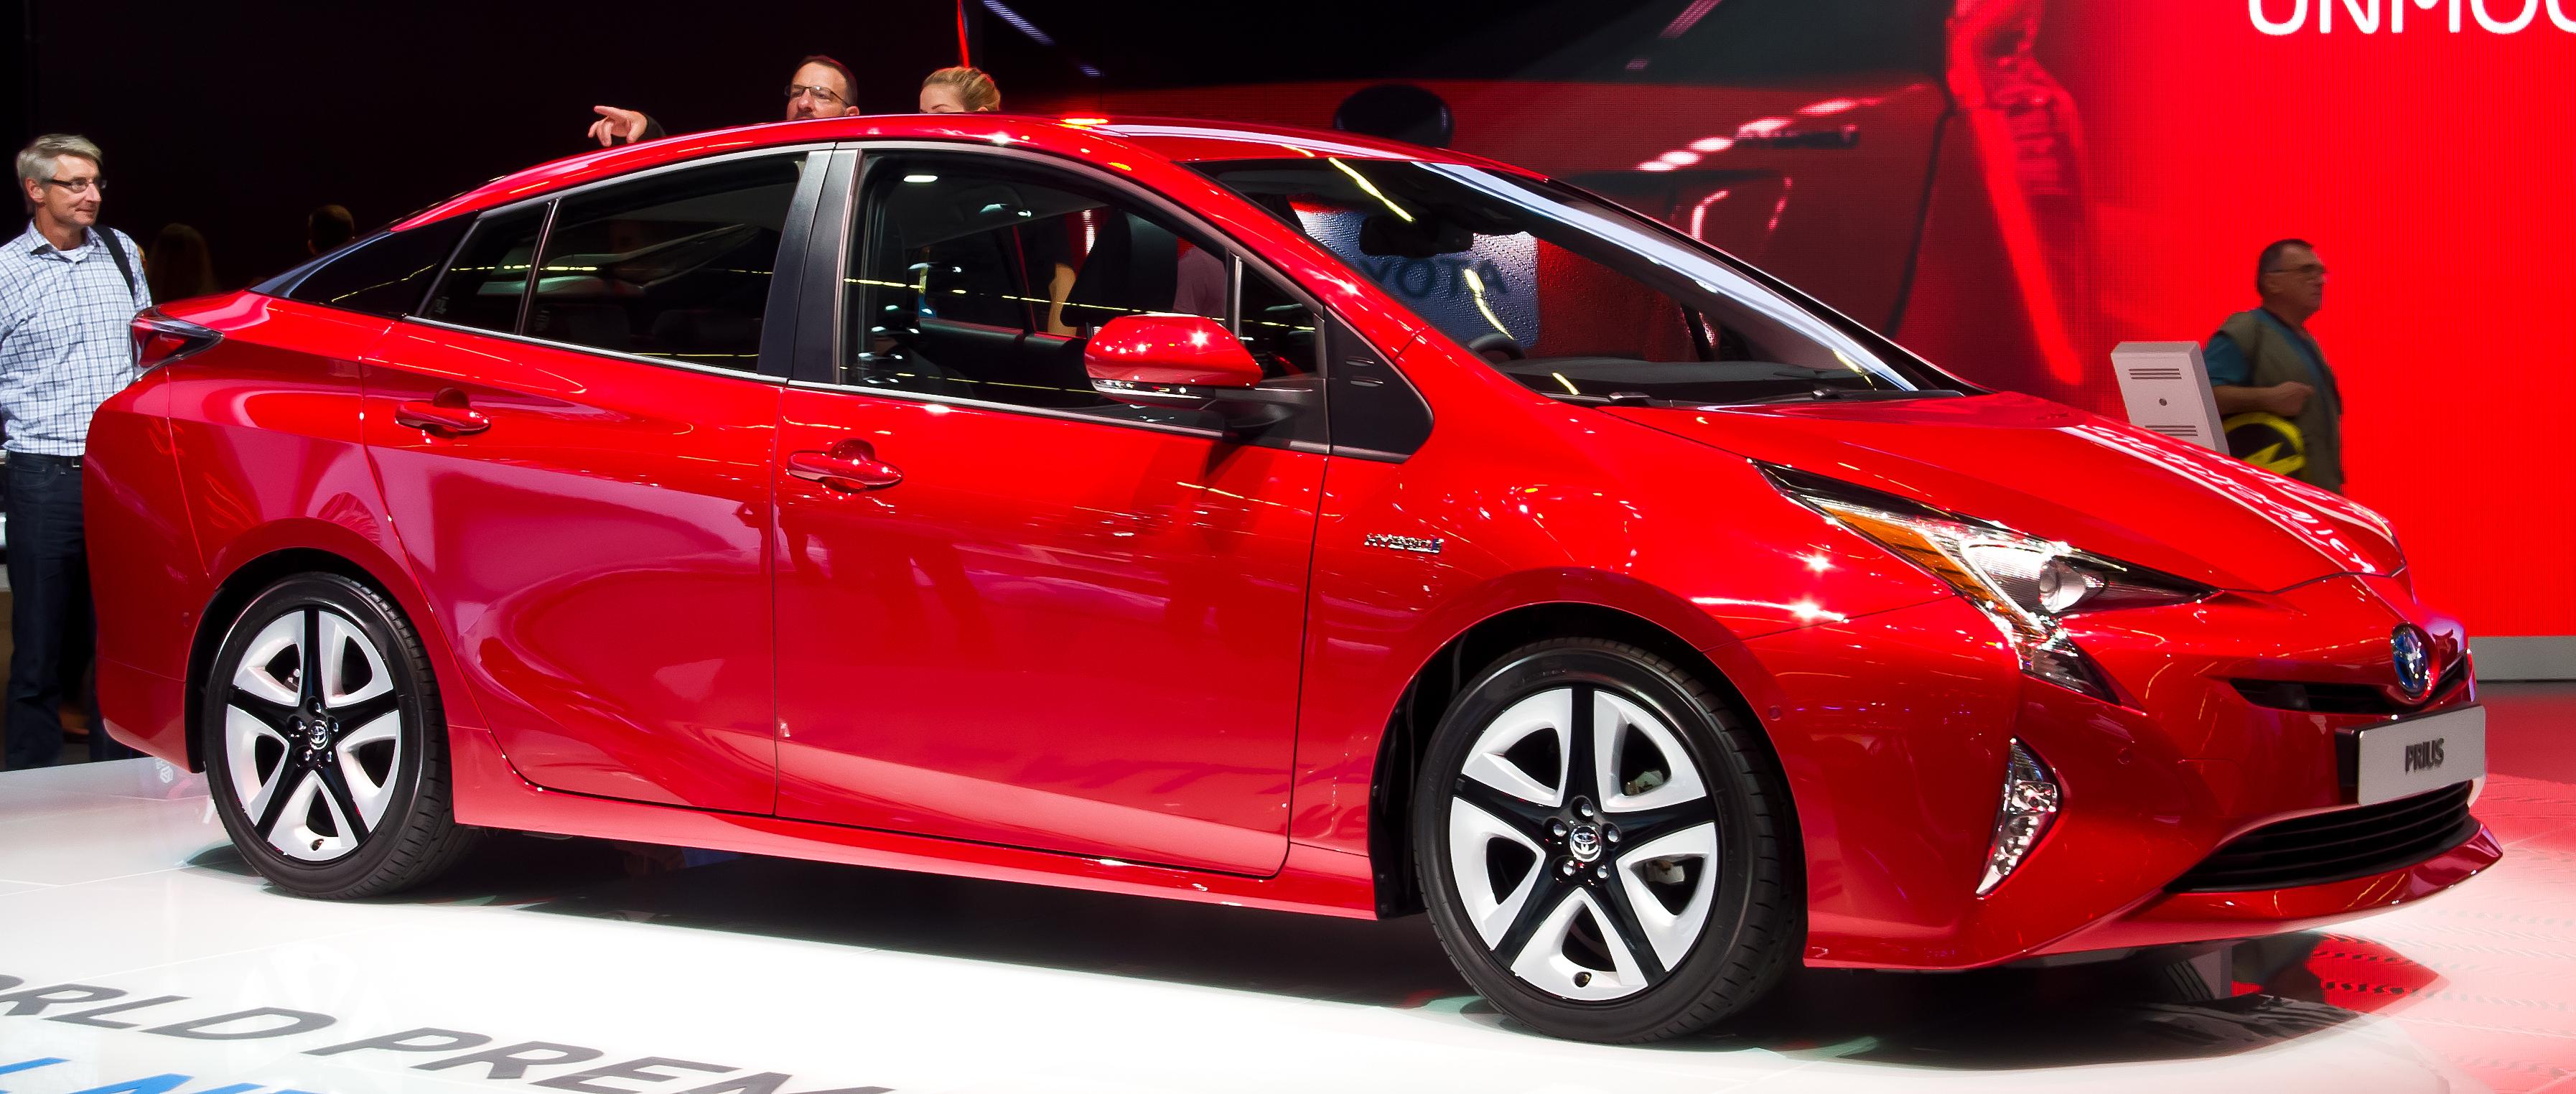 Lexus CT 200H, Toyota Prius top reliability ratings | WINK ...